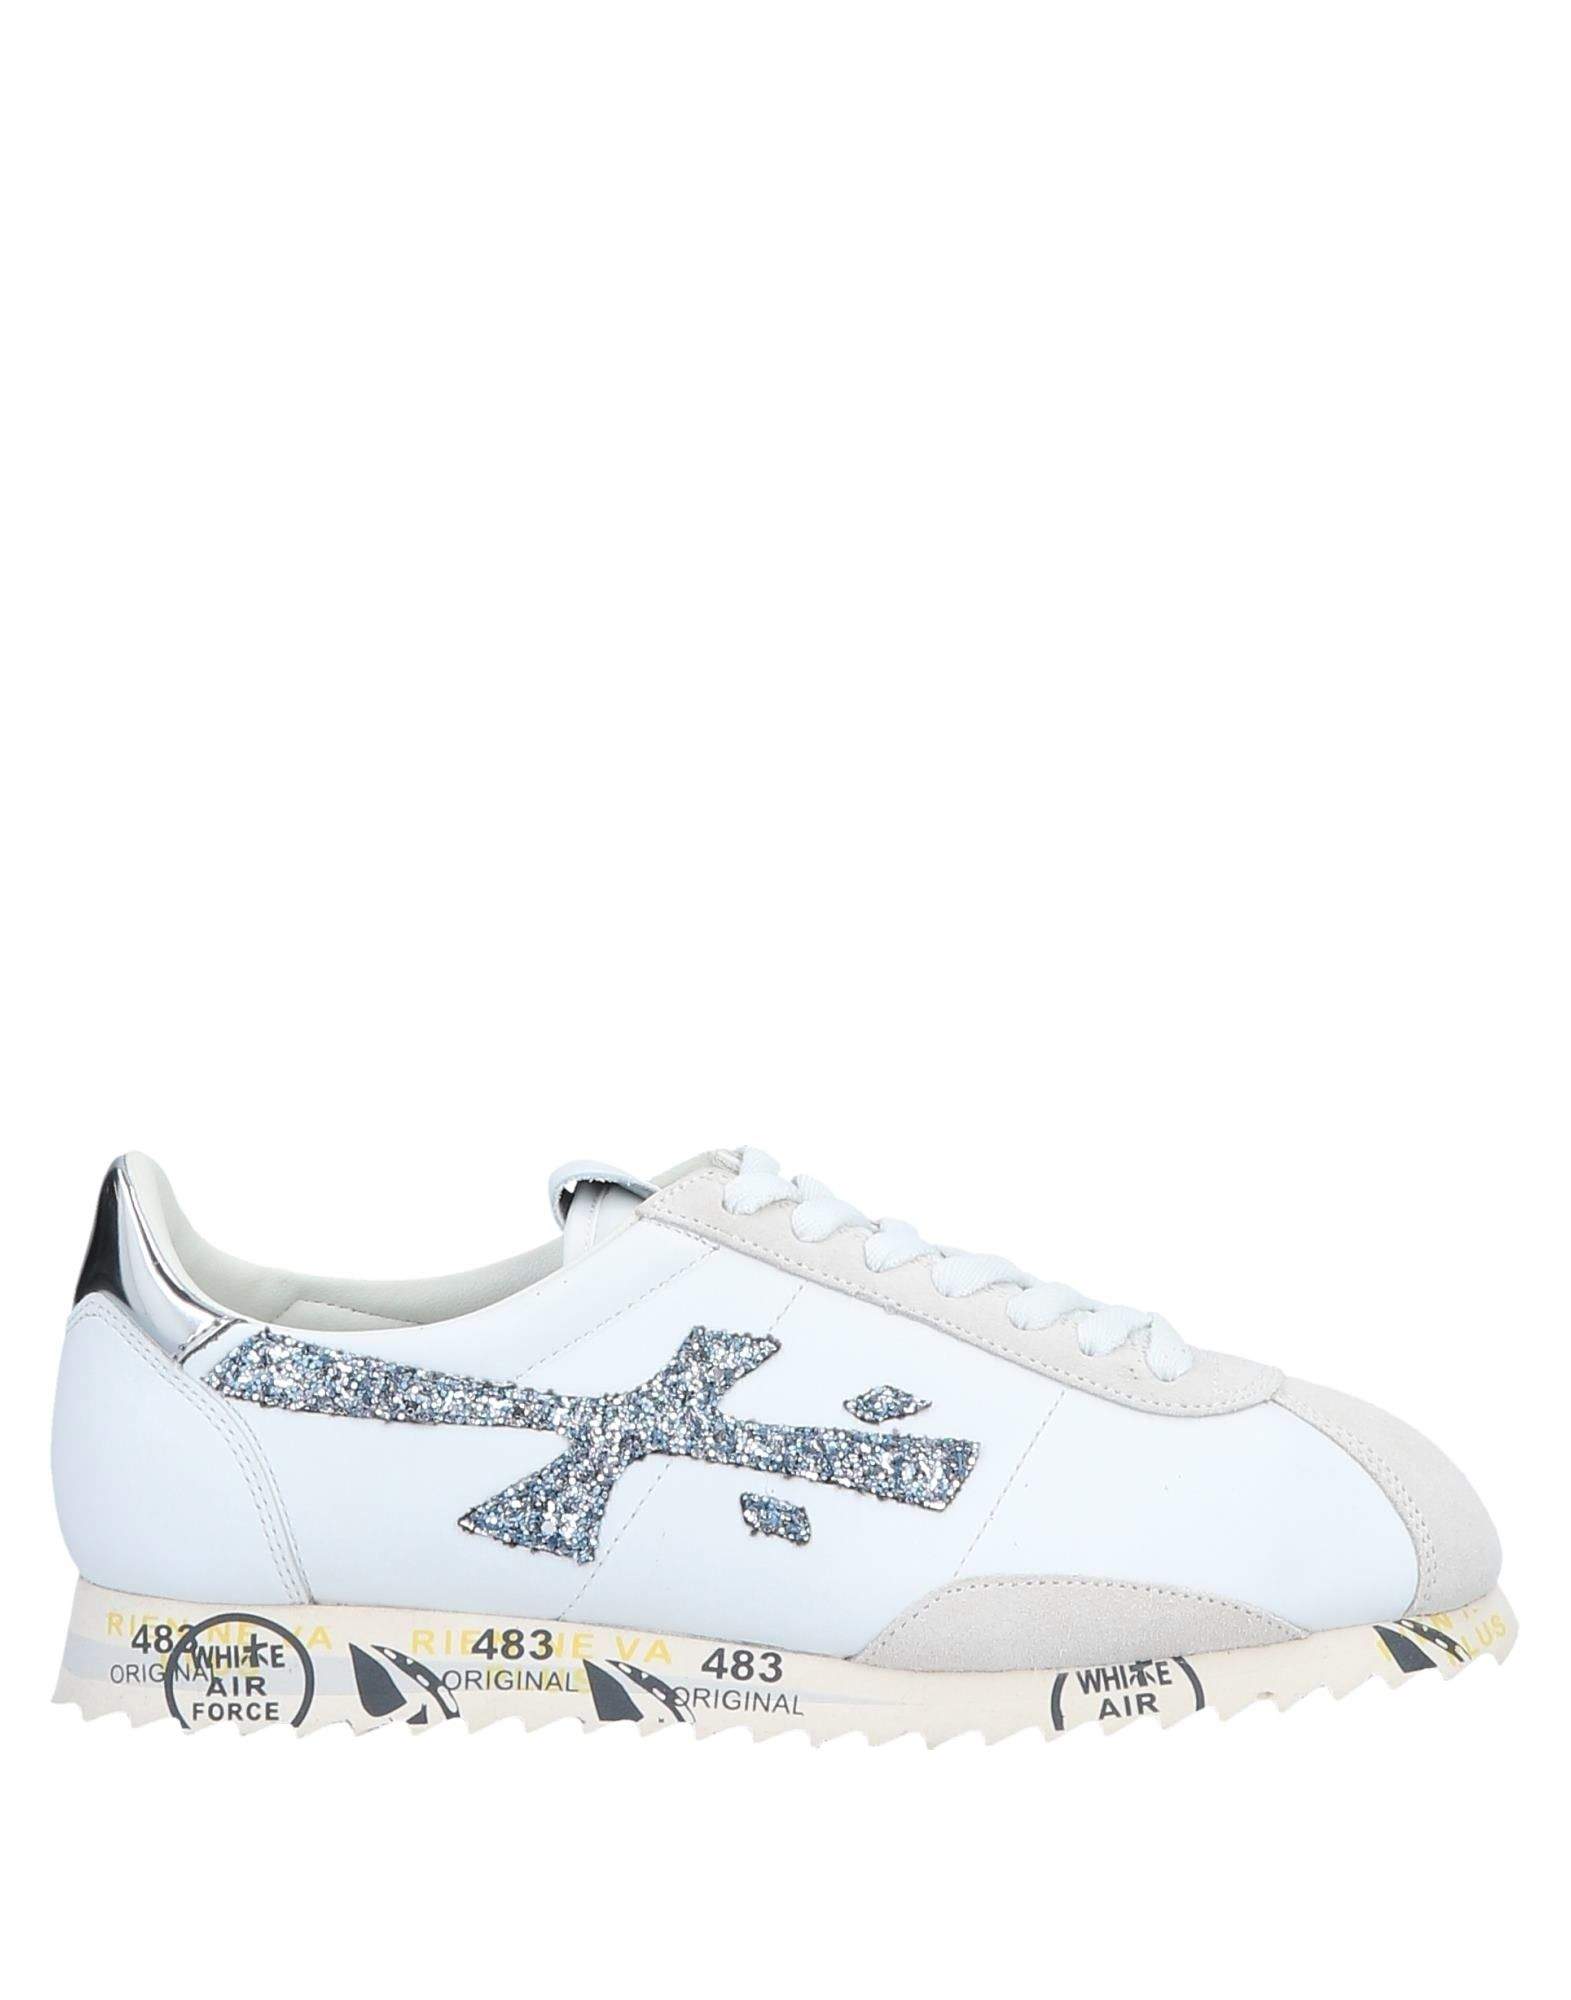 Premiata Sneakers - Women Premiata Sneakers online on 11570487XT  United Kingdom - 11570487XT on 0f4588